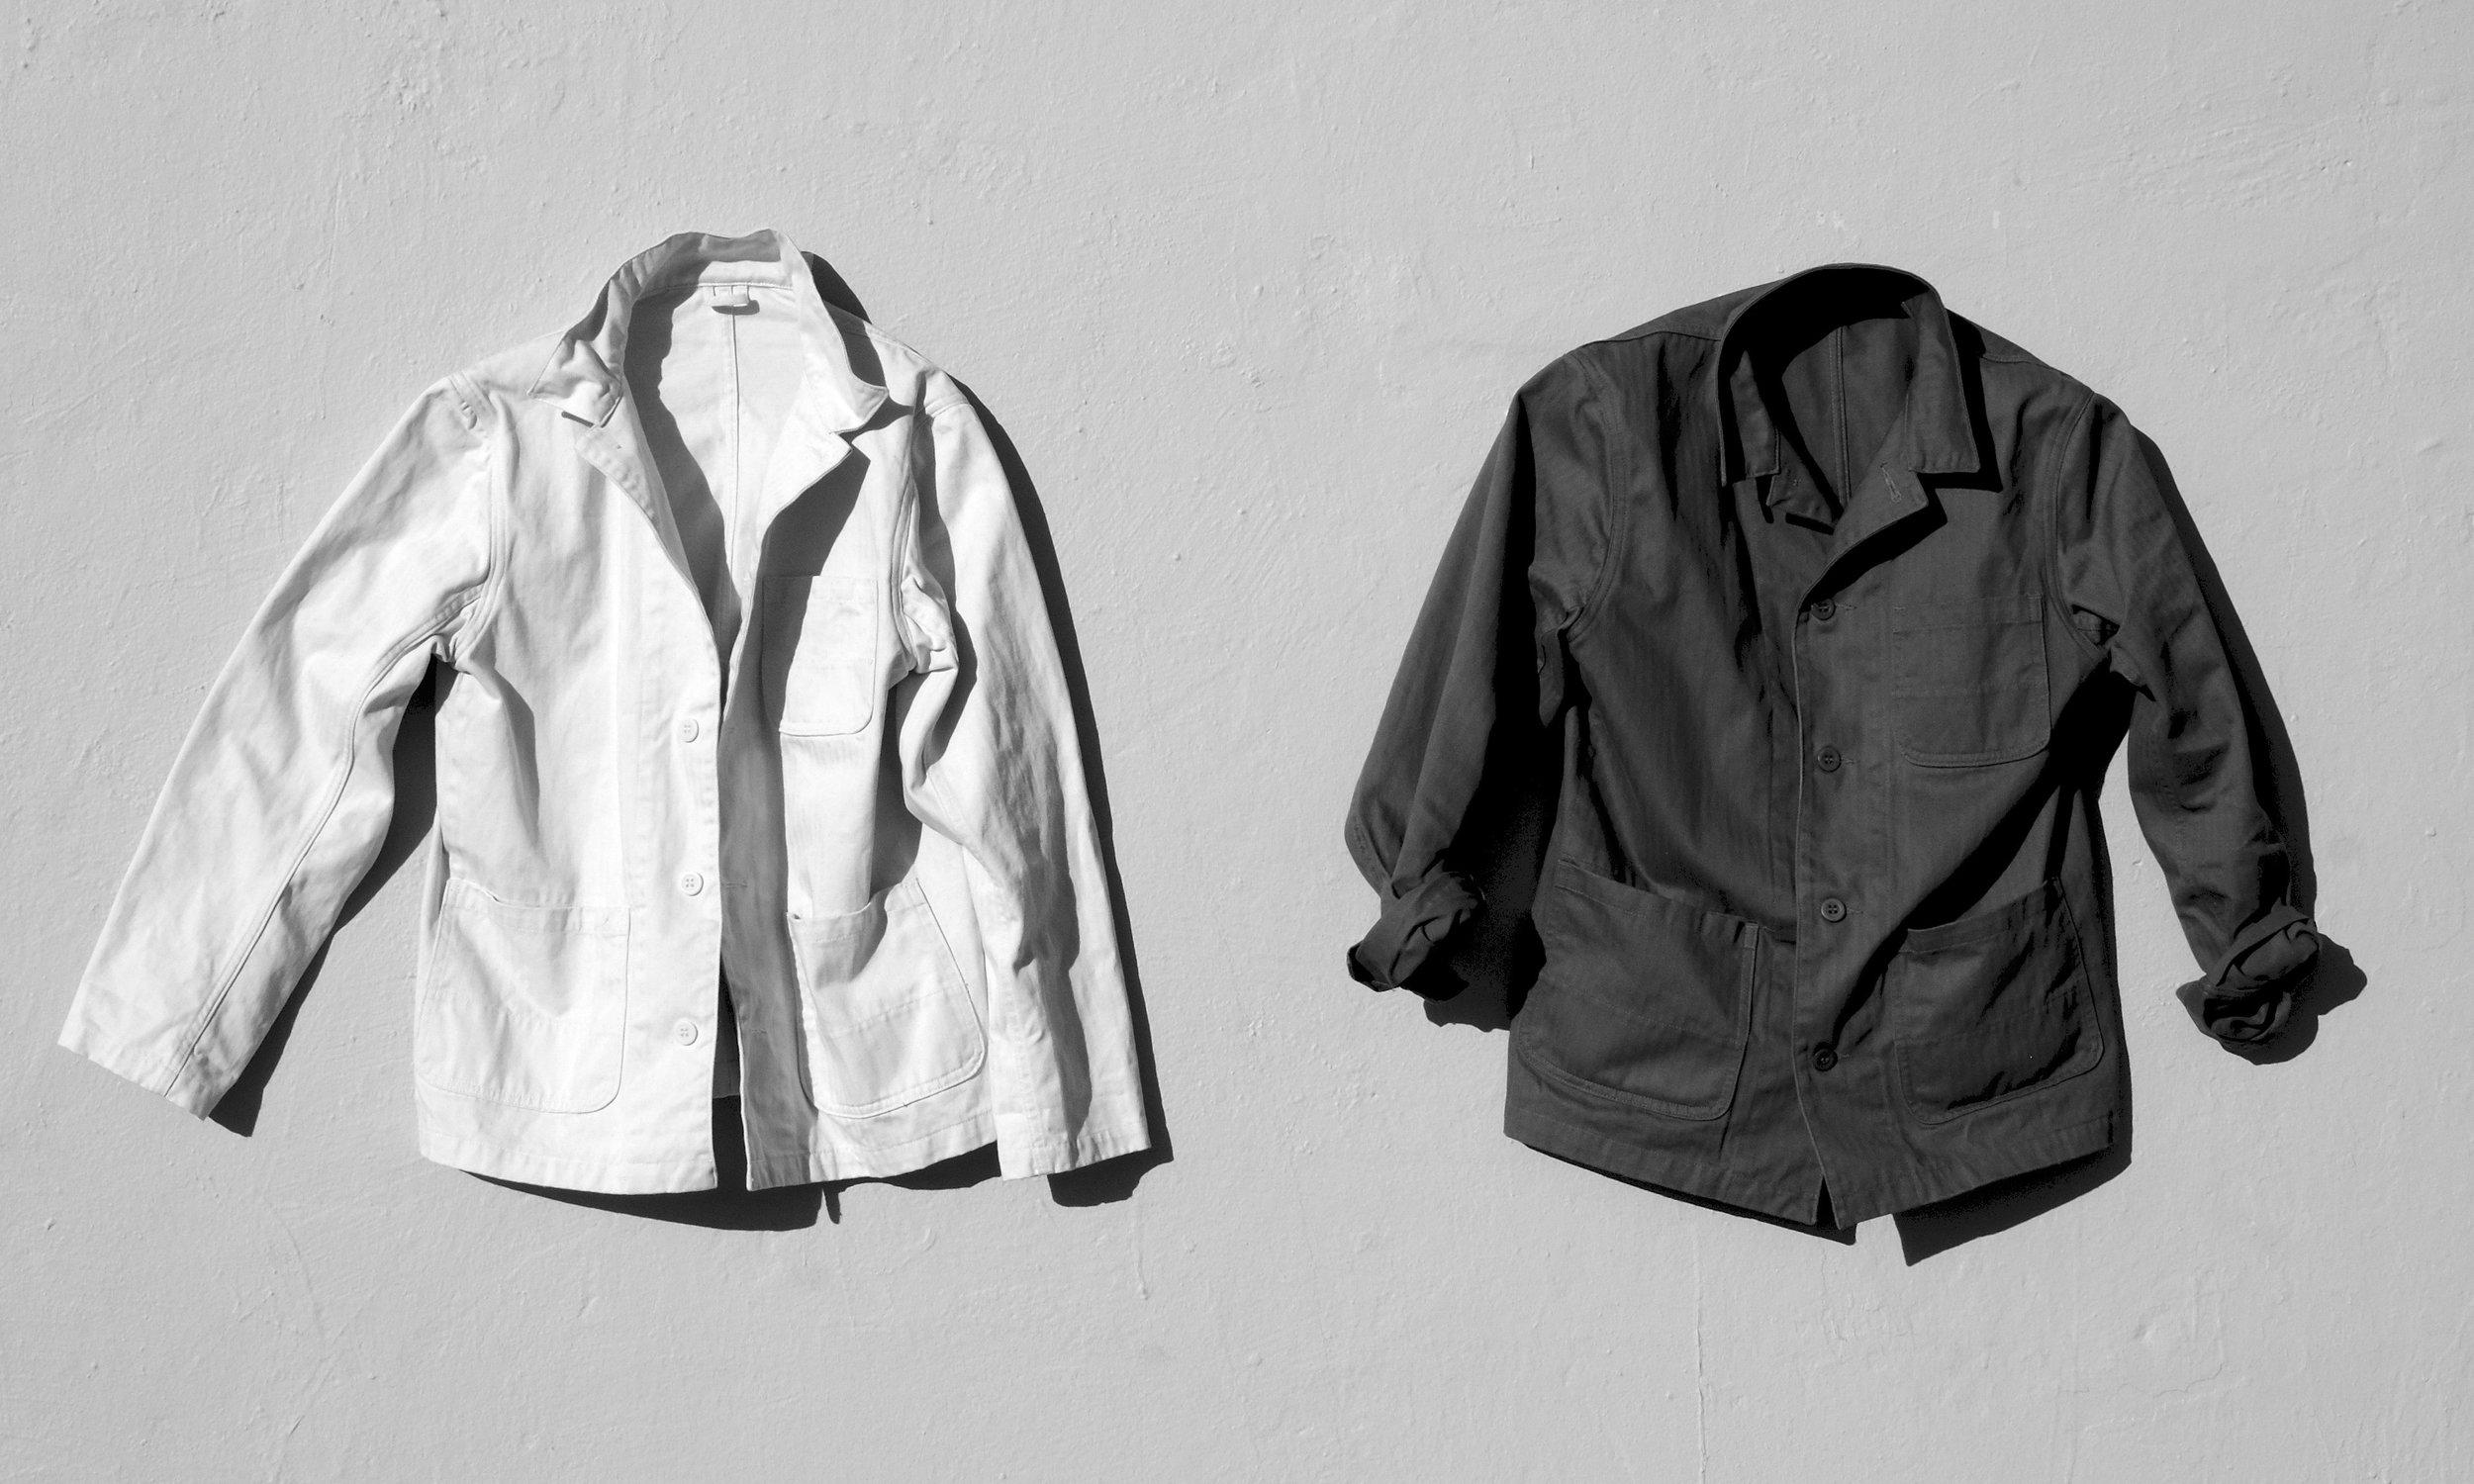 L. Bourgeois Jacket